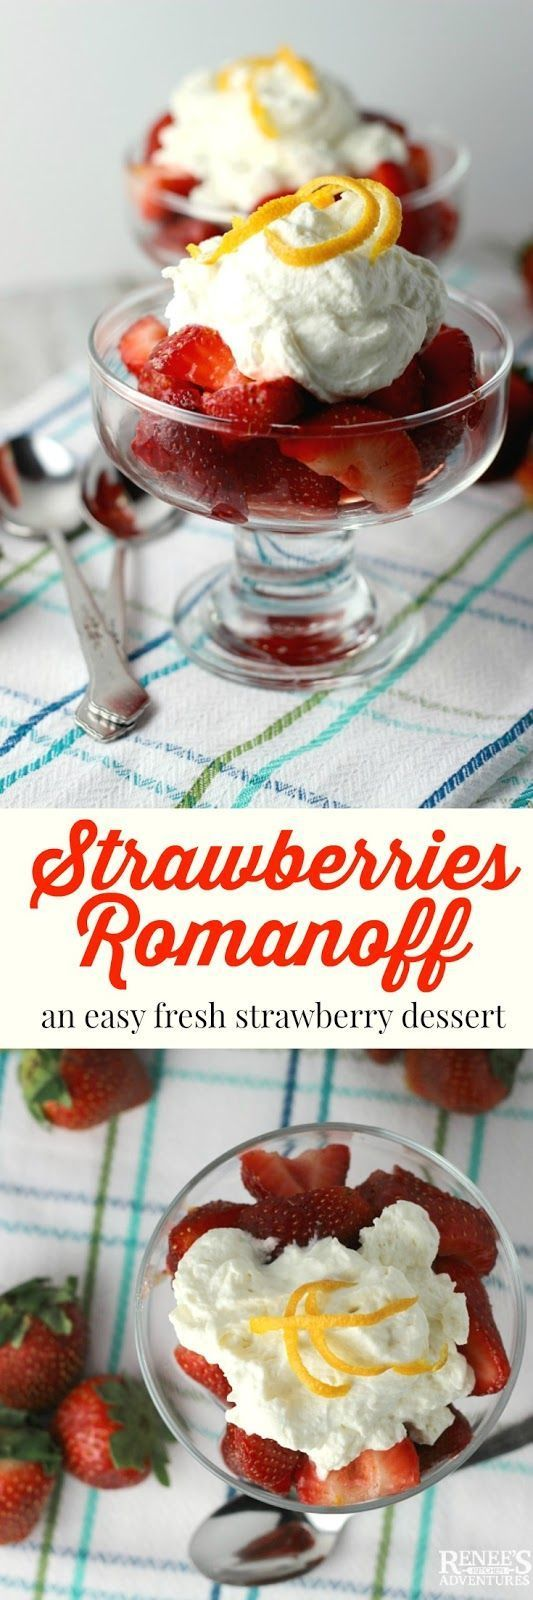 Strawberries Romanoff | Renee's Kitchen Adventures - easy recipe for a ...